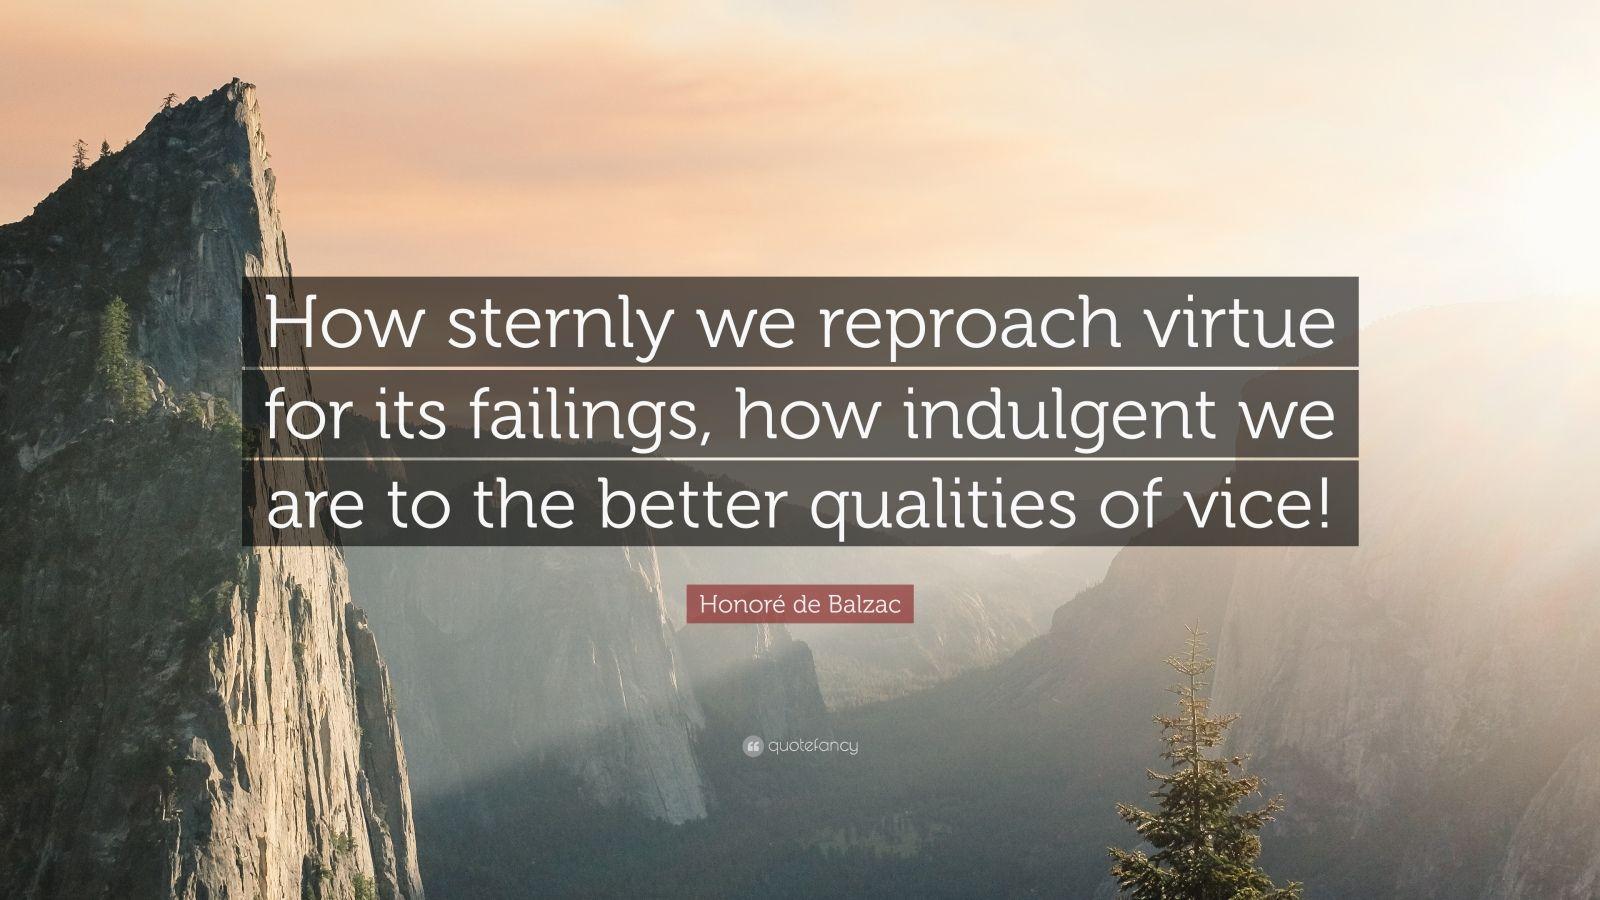 honoré de balzac quote how sternly we reproach virtue